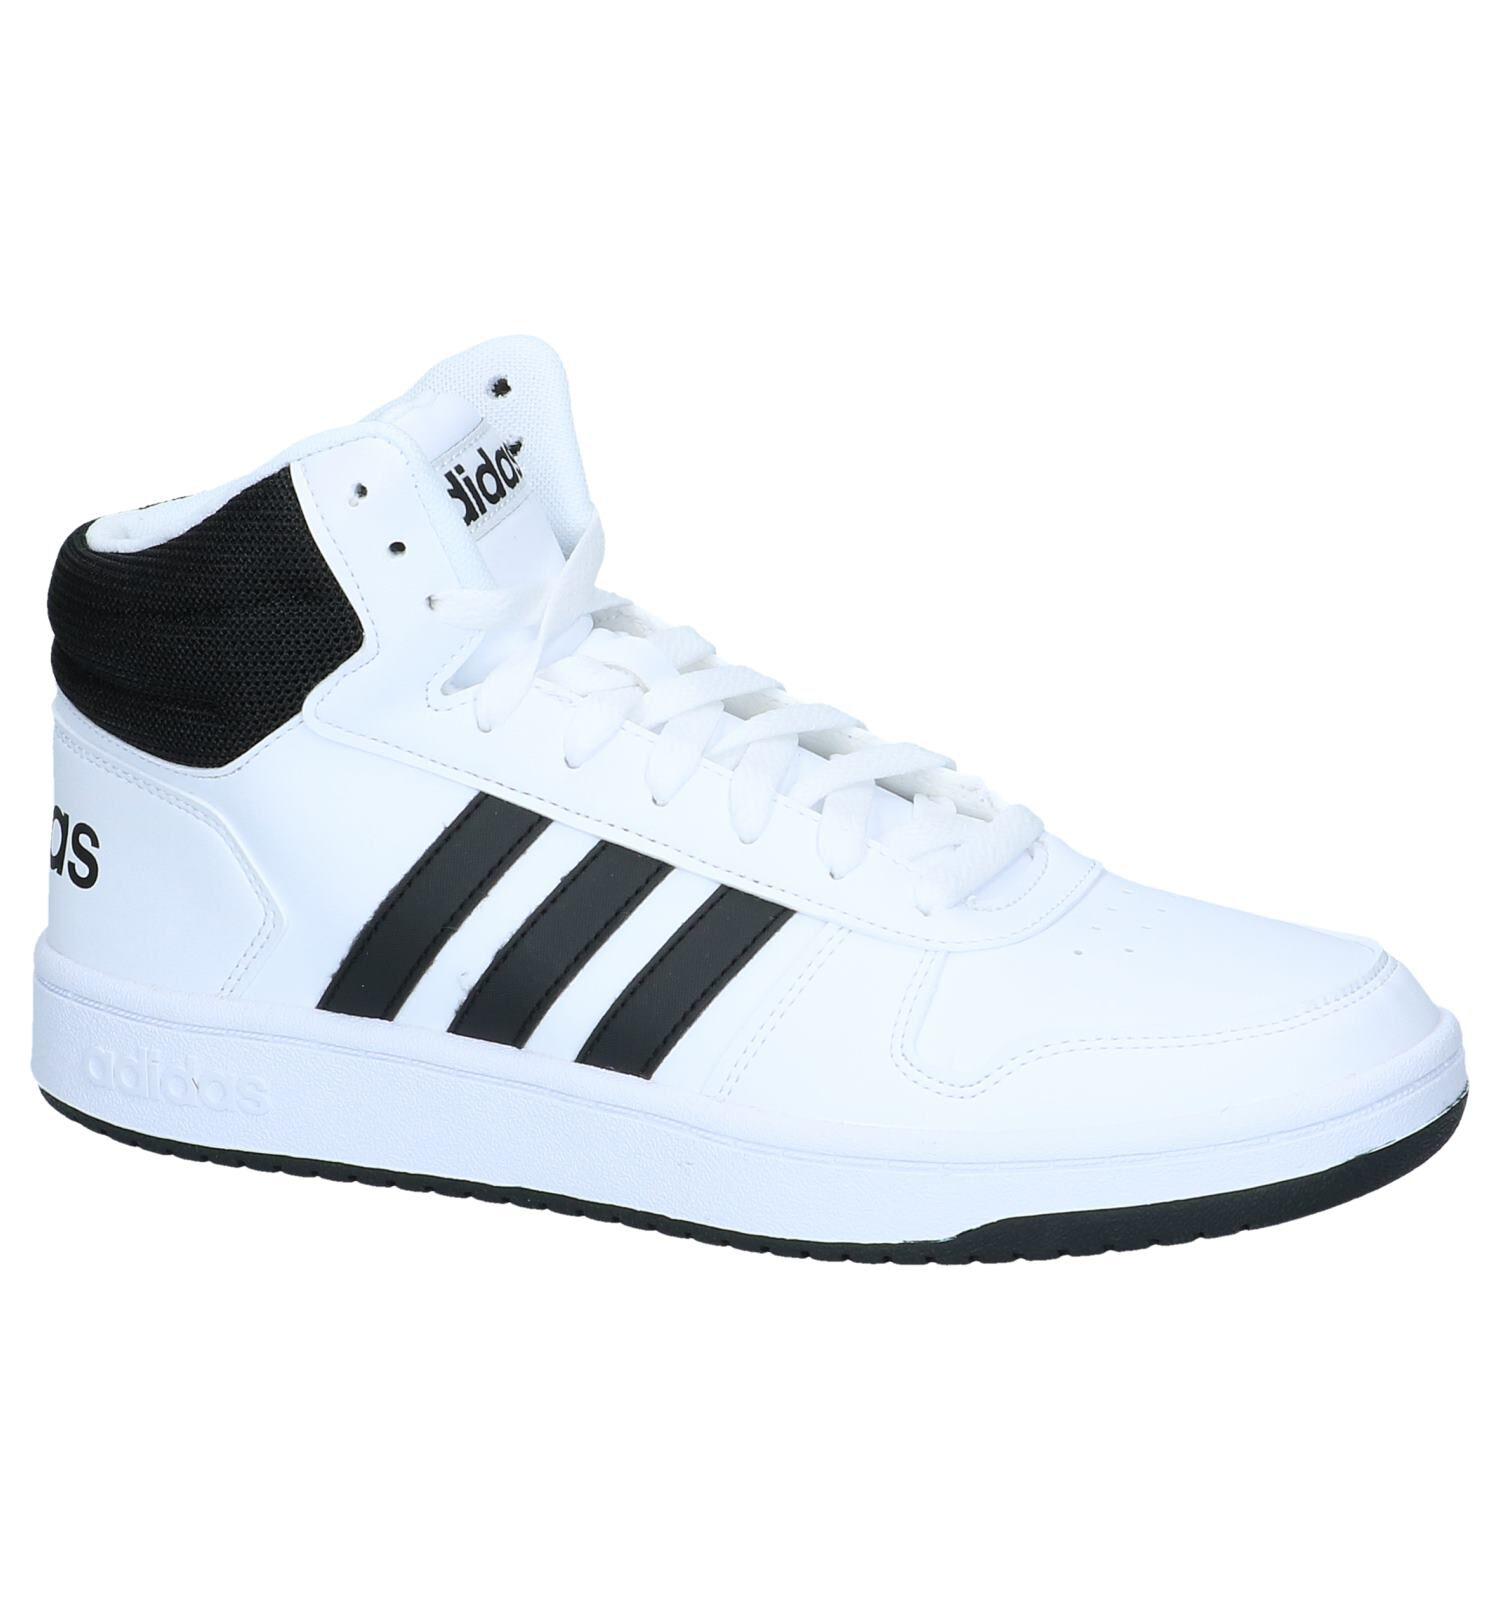 adidas Hoops 2.0 Witte Hoge Sneakers | SCHOENENTORFS.NL